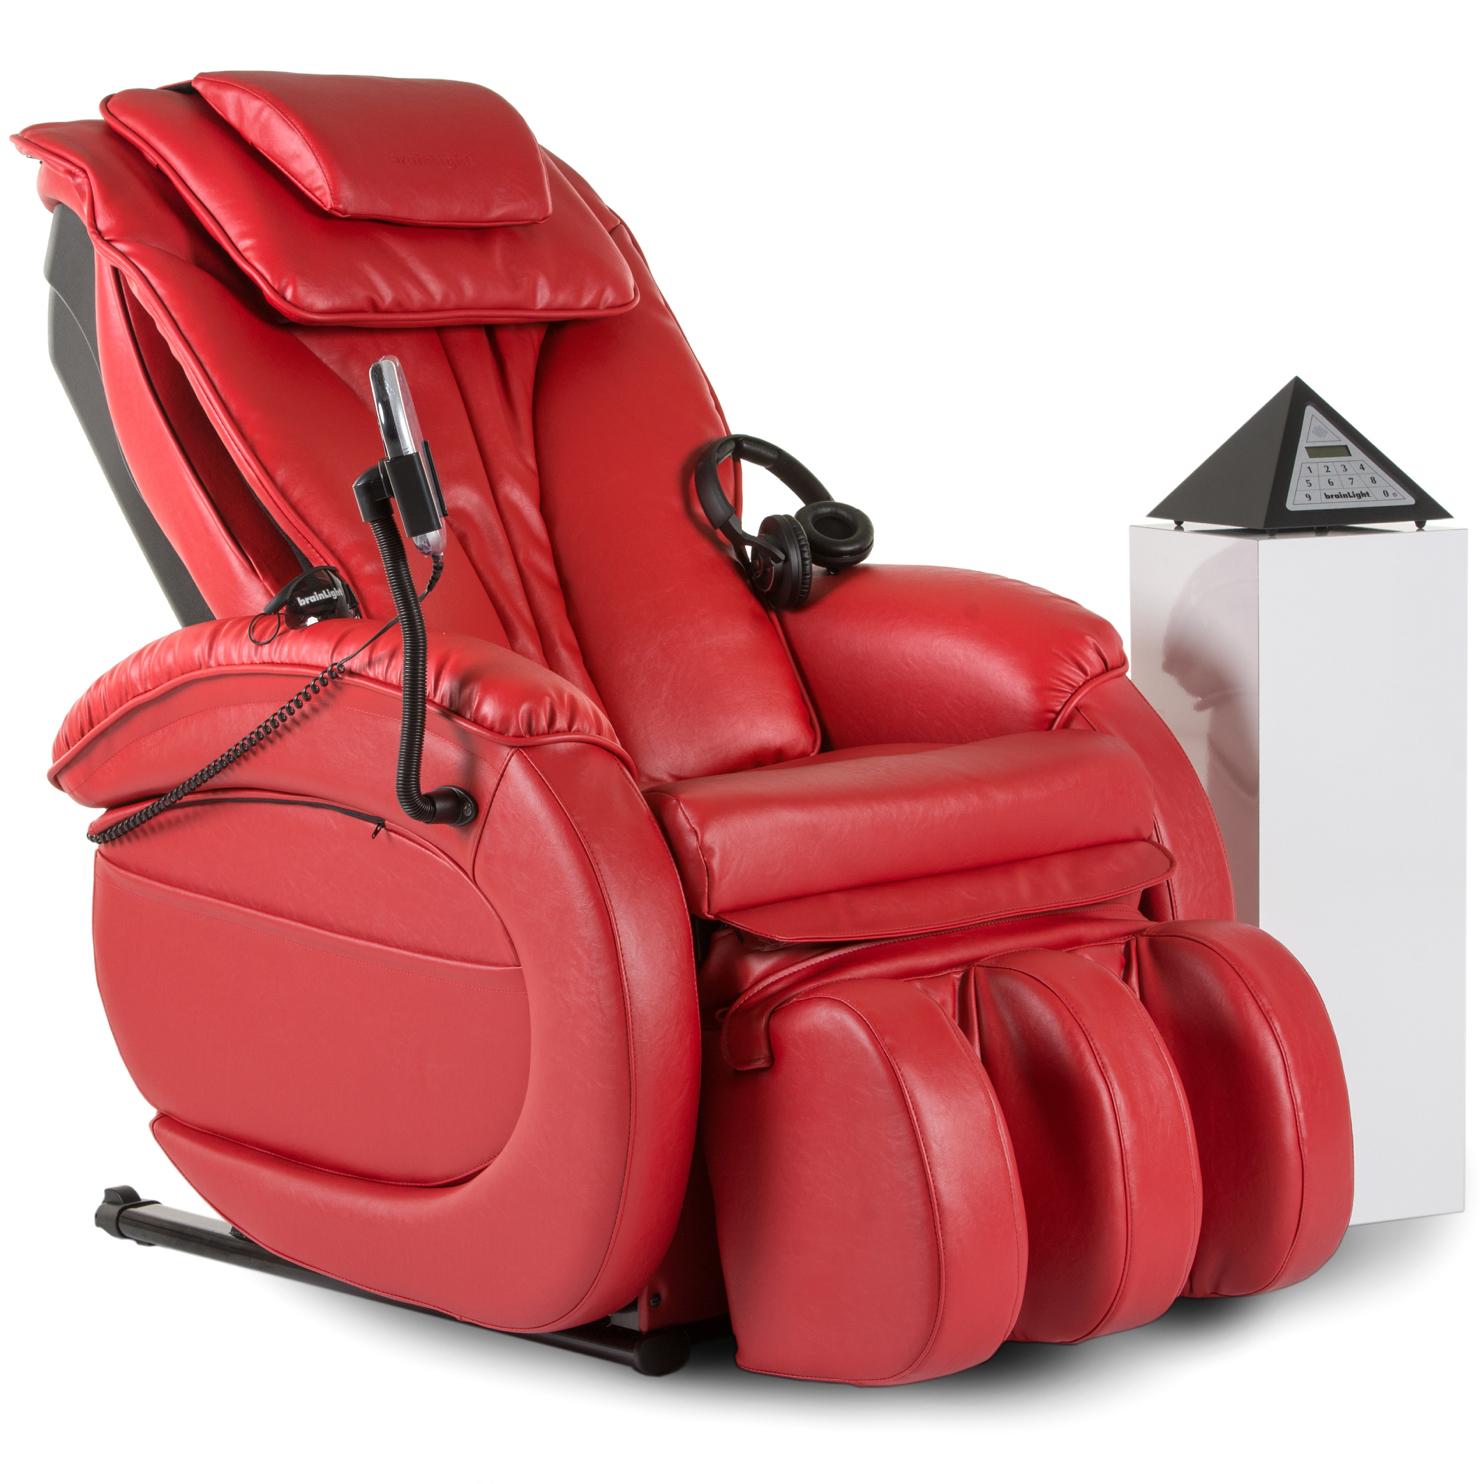 brainlight gmbh brainlight touch synchro complete mit shiatsu massagesessel gravity plus. Black Bedroom Furniture Sets. Home Design Ideas